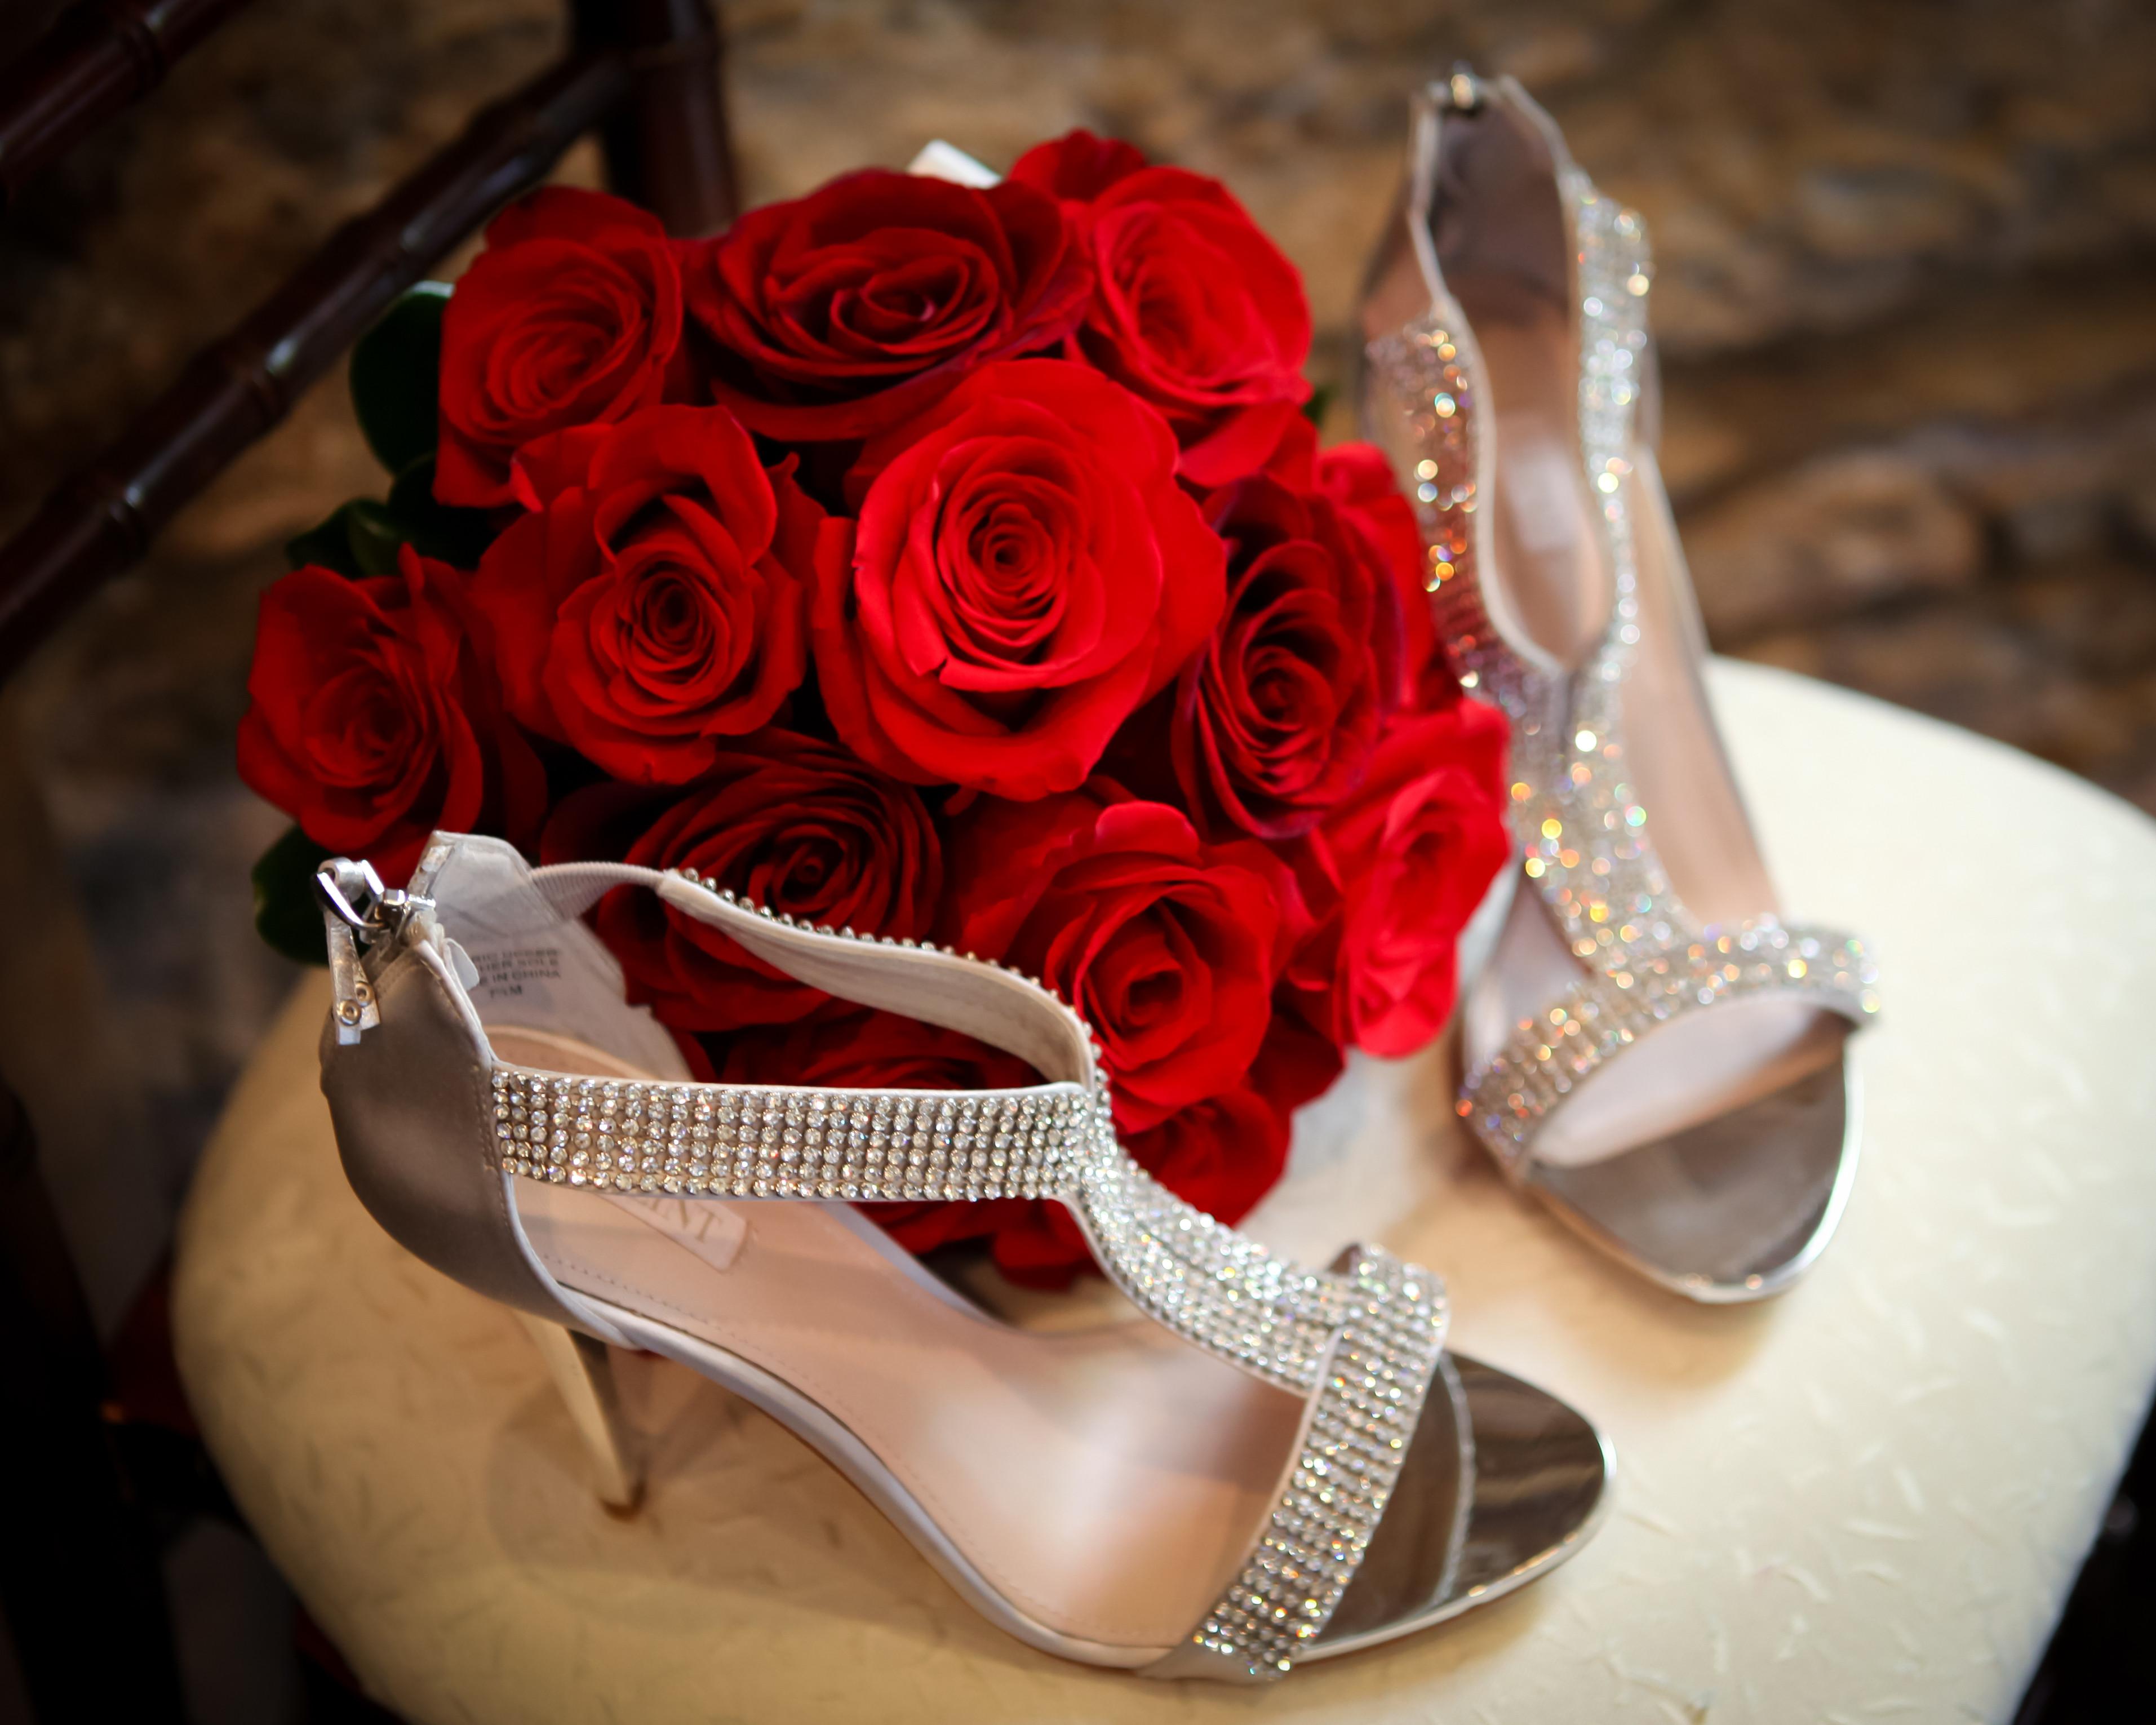 1 Hour of Wedding Photography